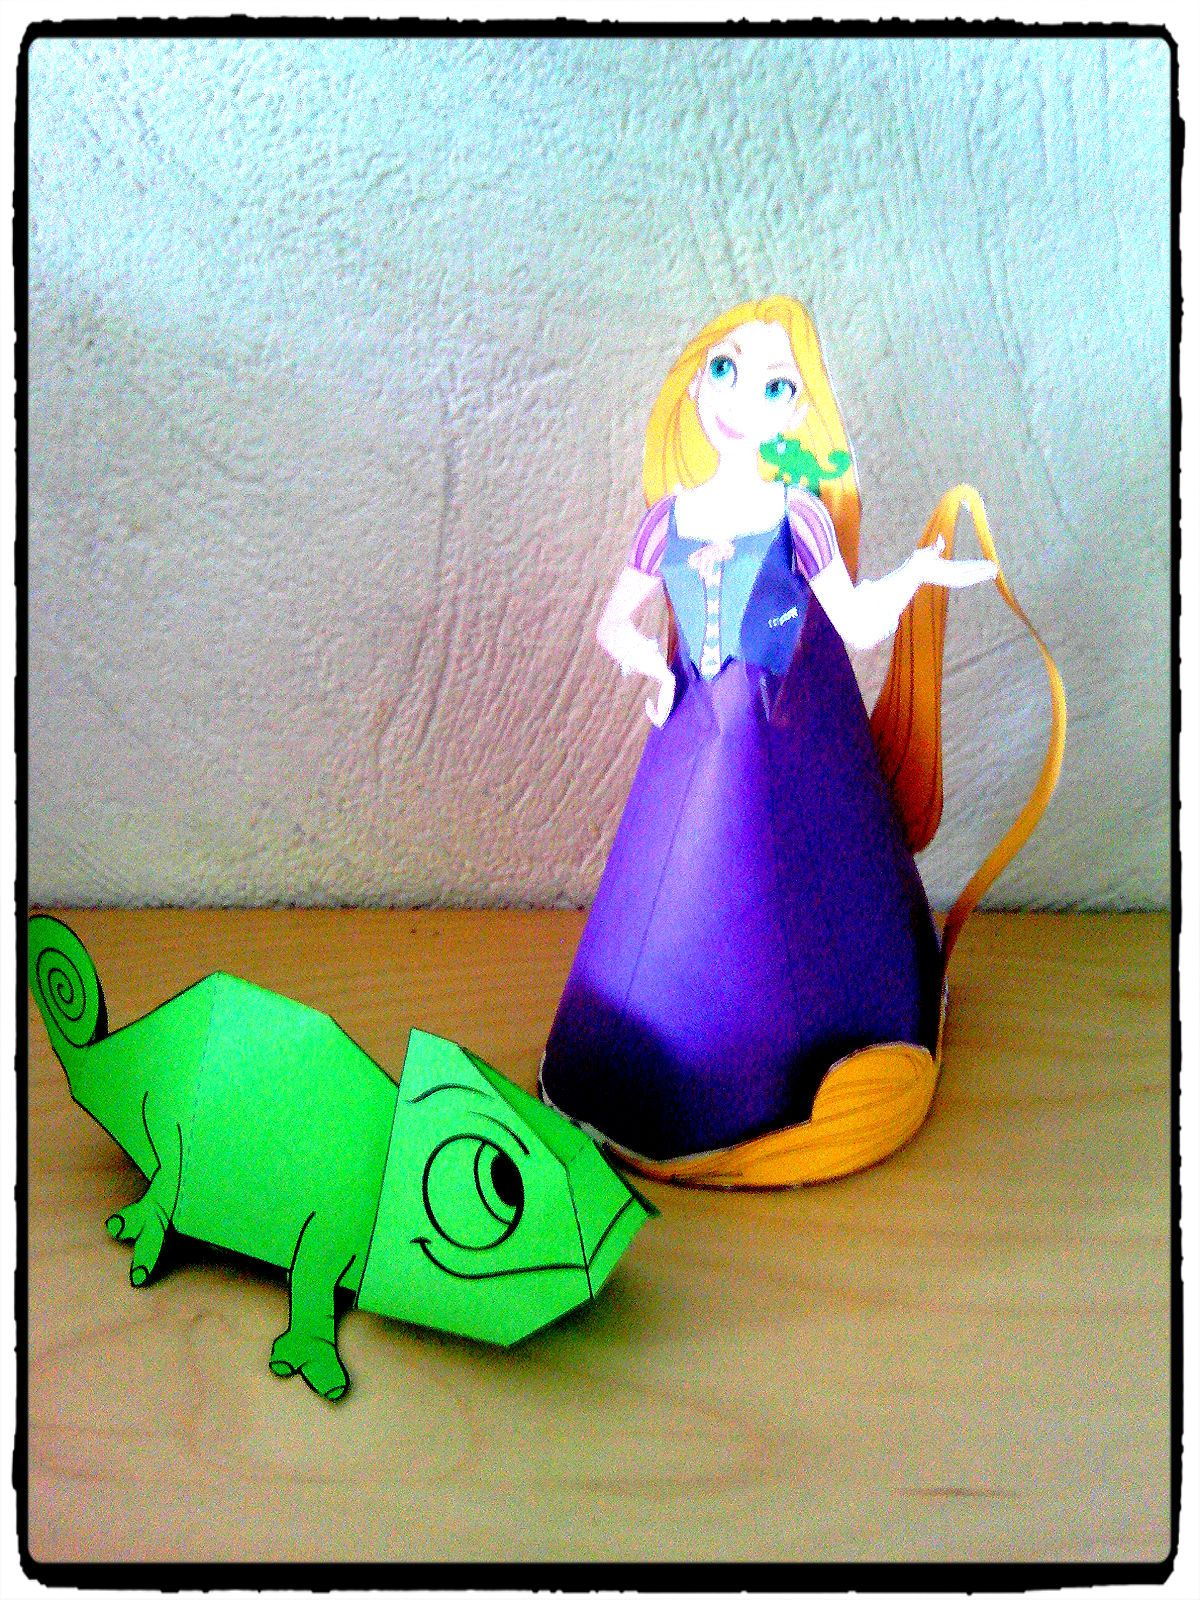 anniversaire 4 ans ashley thme raiponce mes humeurs cratives - Raiponce Pascal